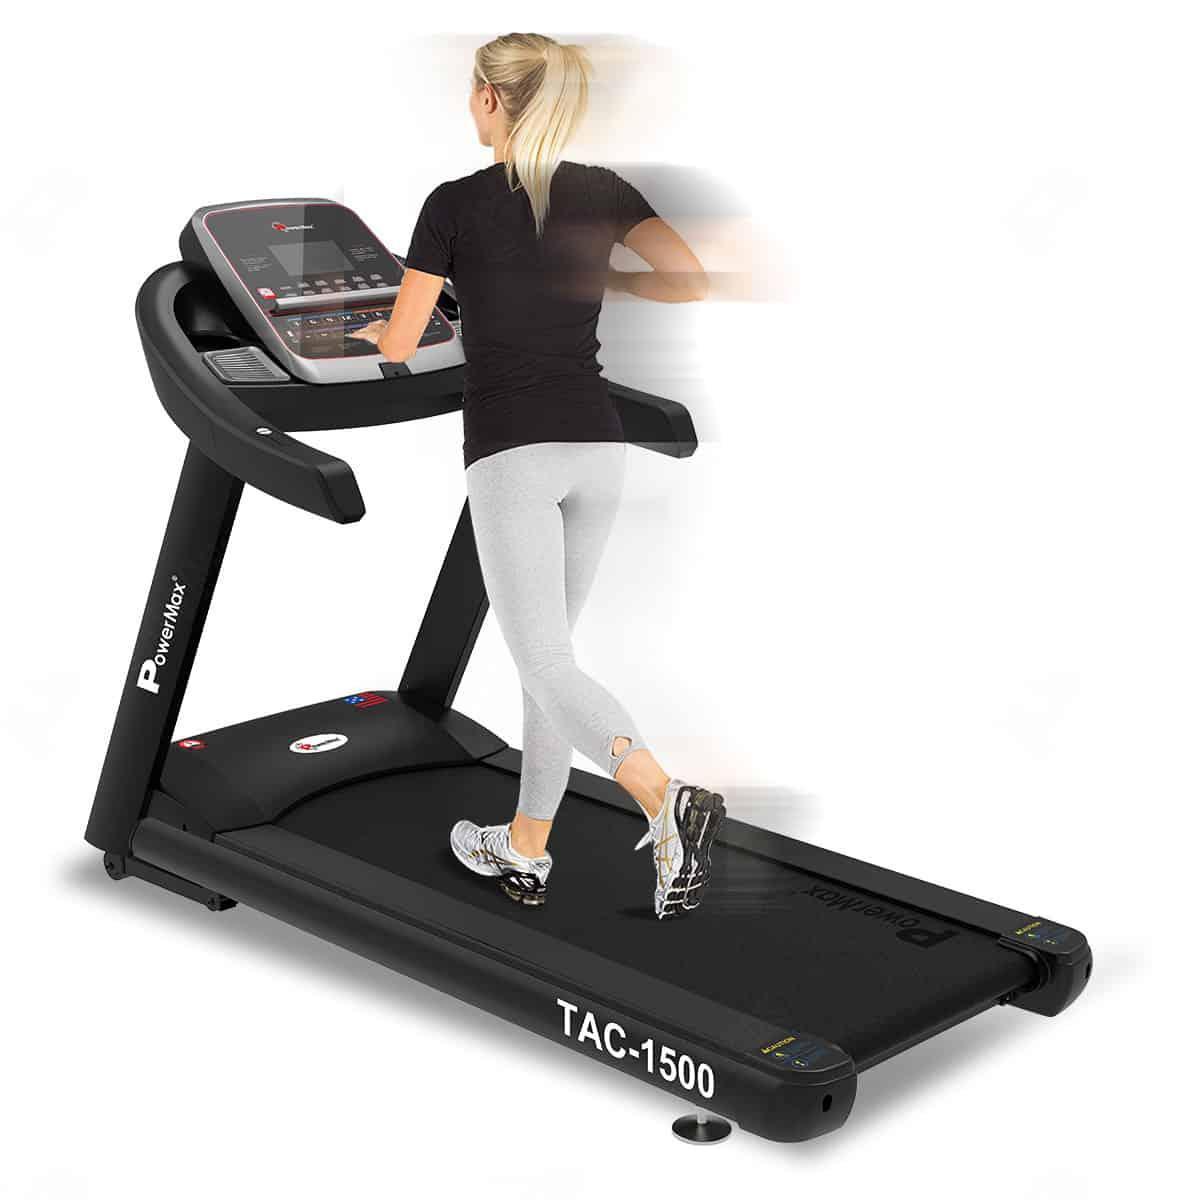 Best Treadmill in India